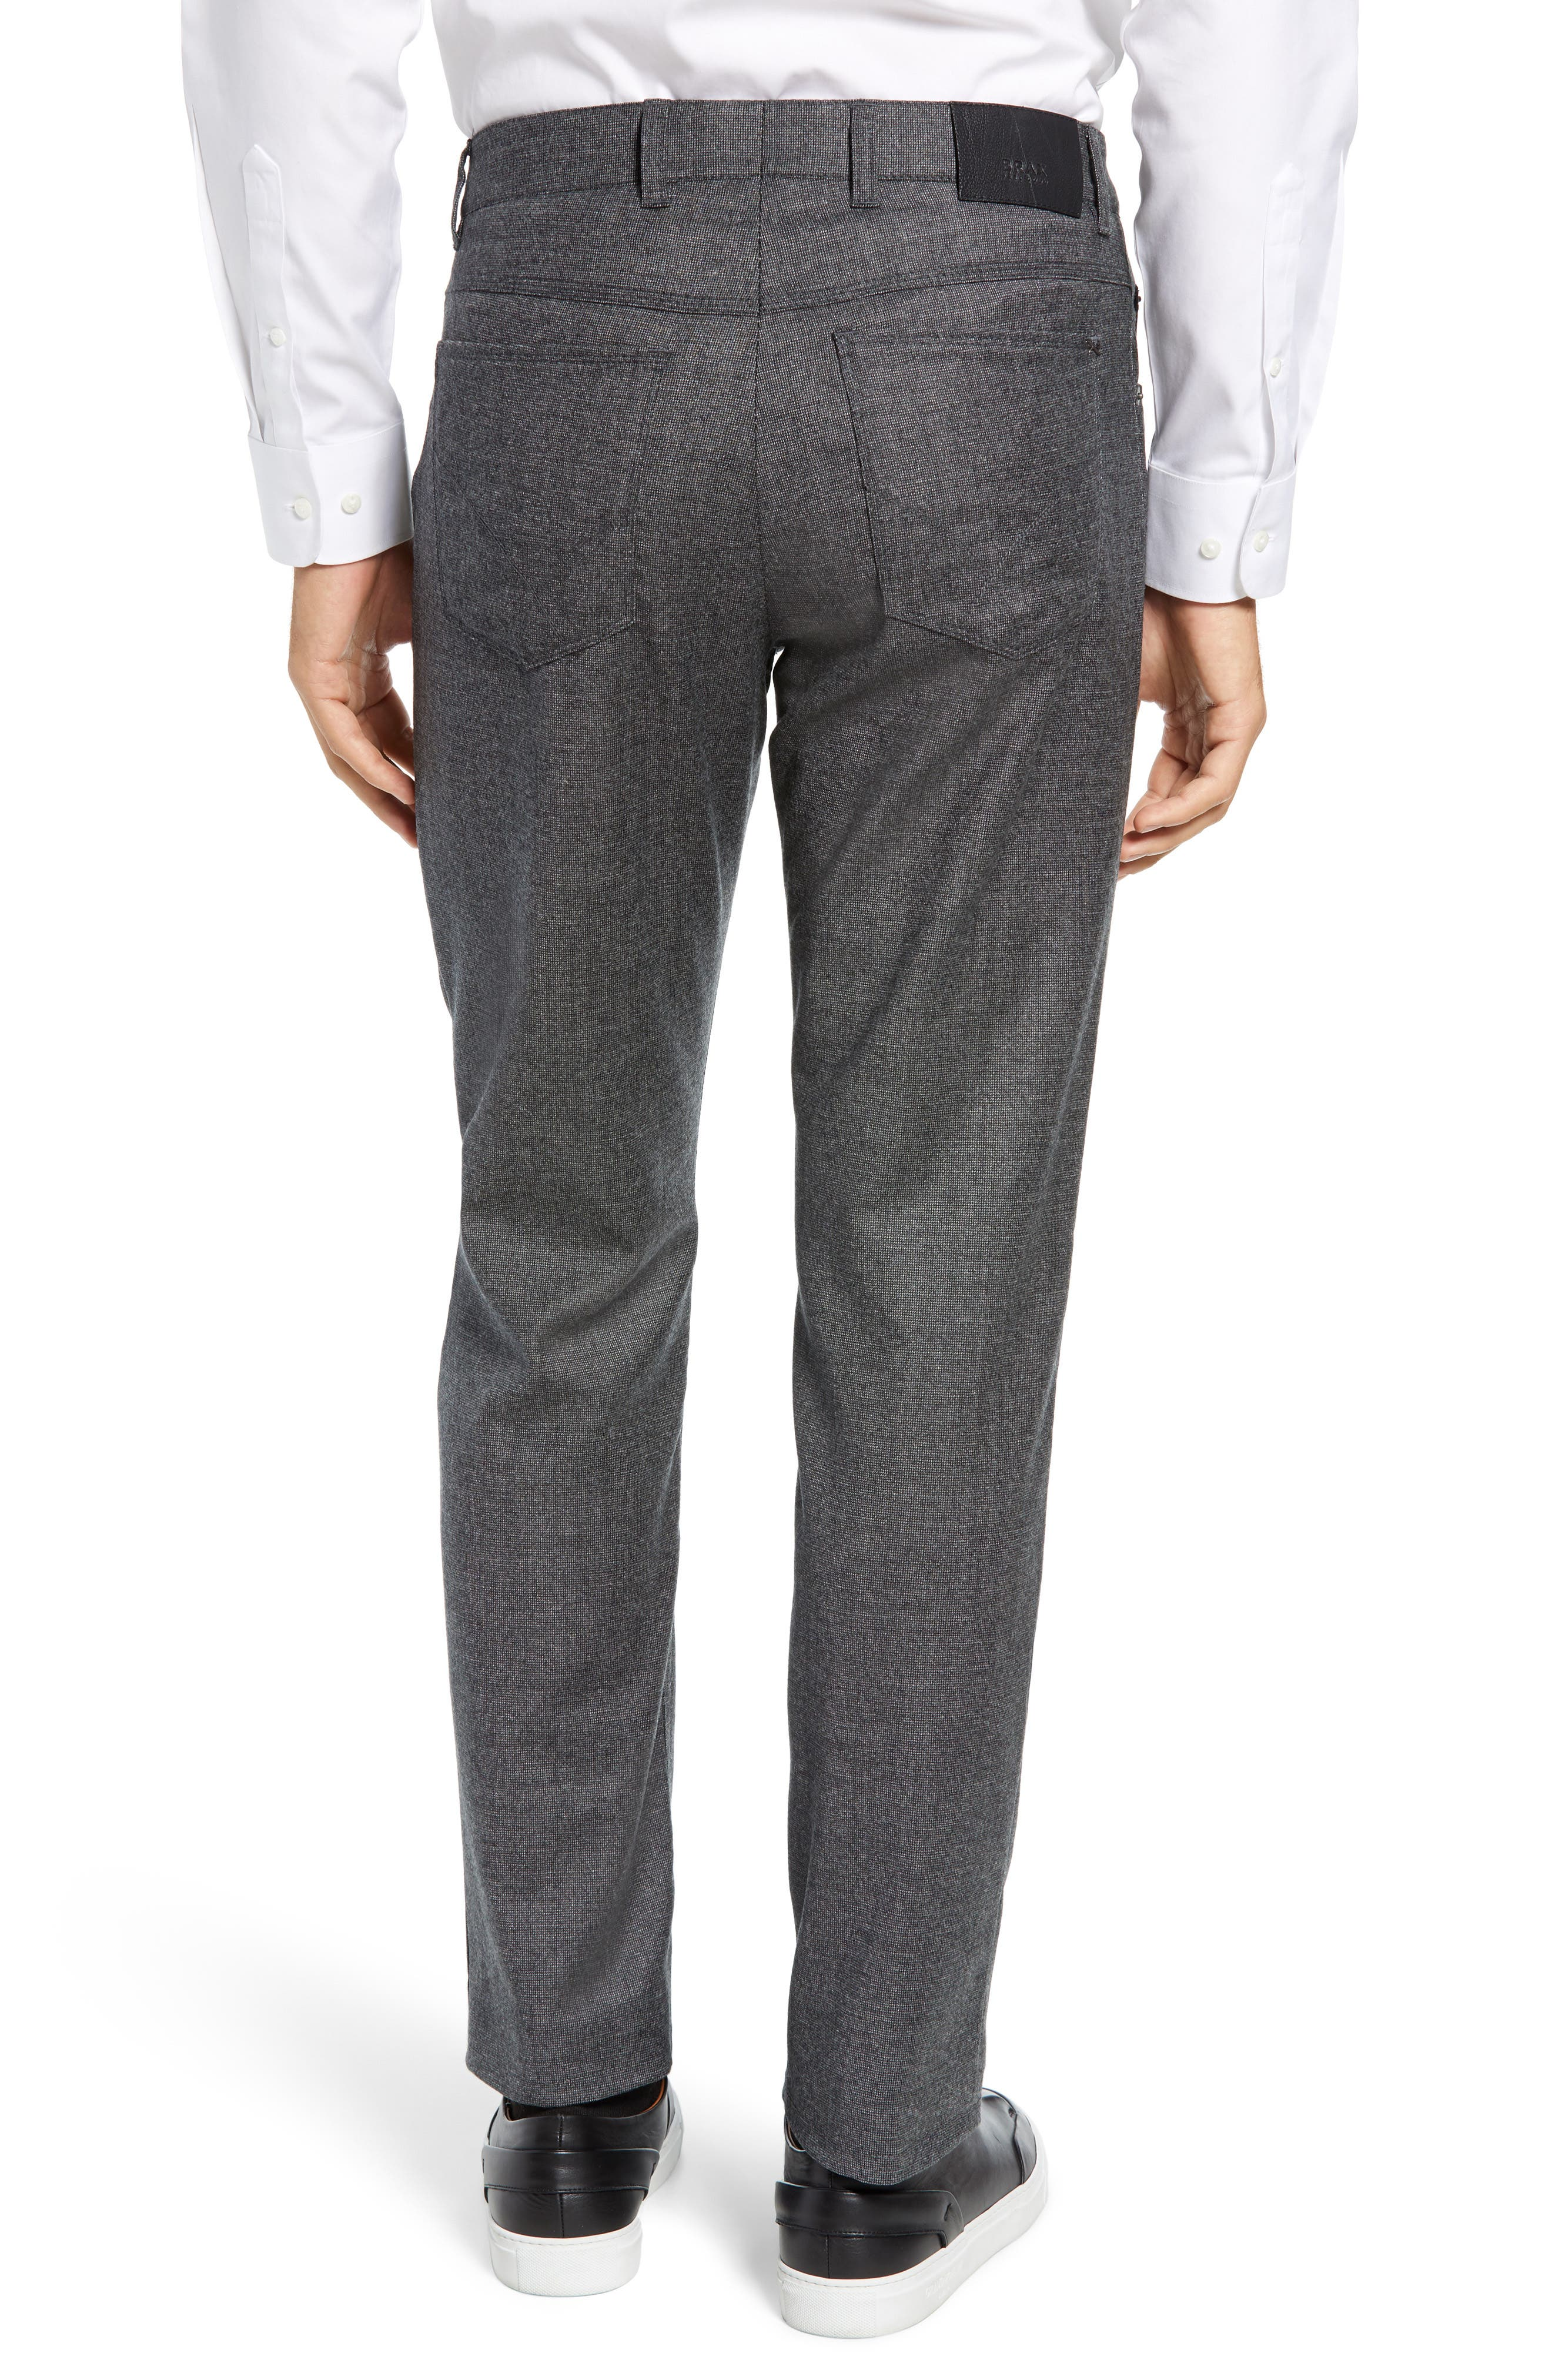 Cadiz Five Pocket Stretch Wool Trousers,                             Alternate thumbnail 2, color,                             GRAPHITE